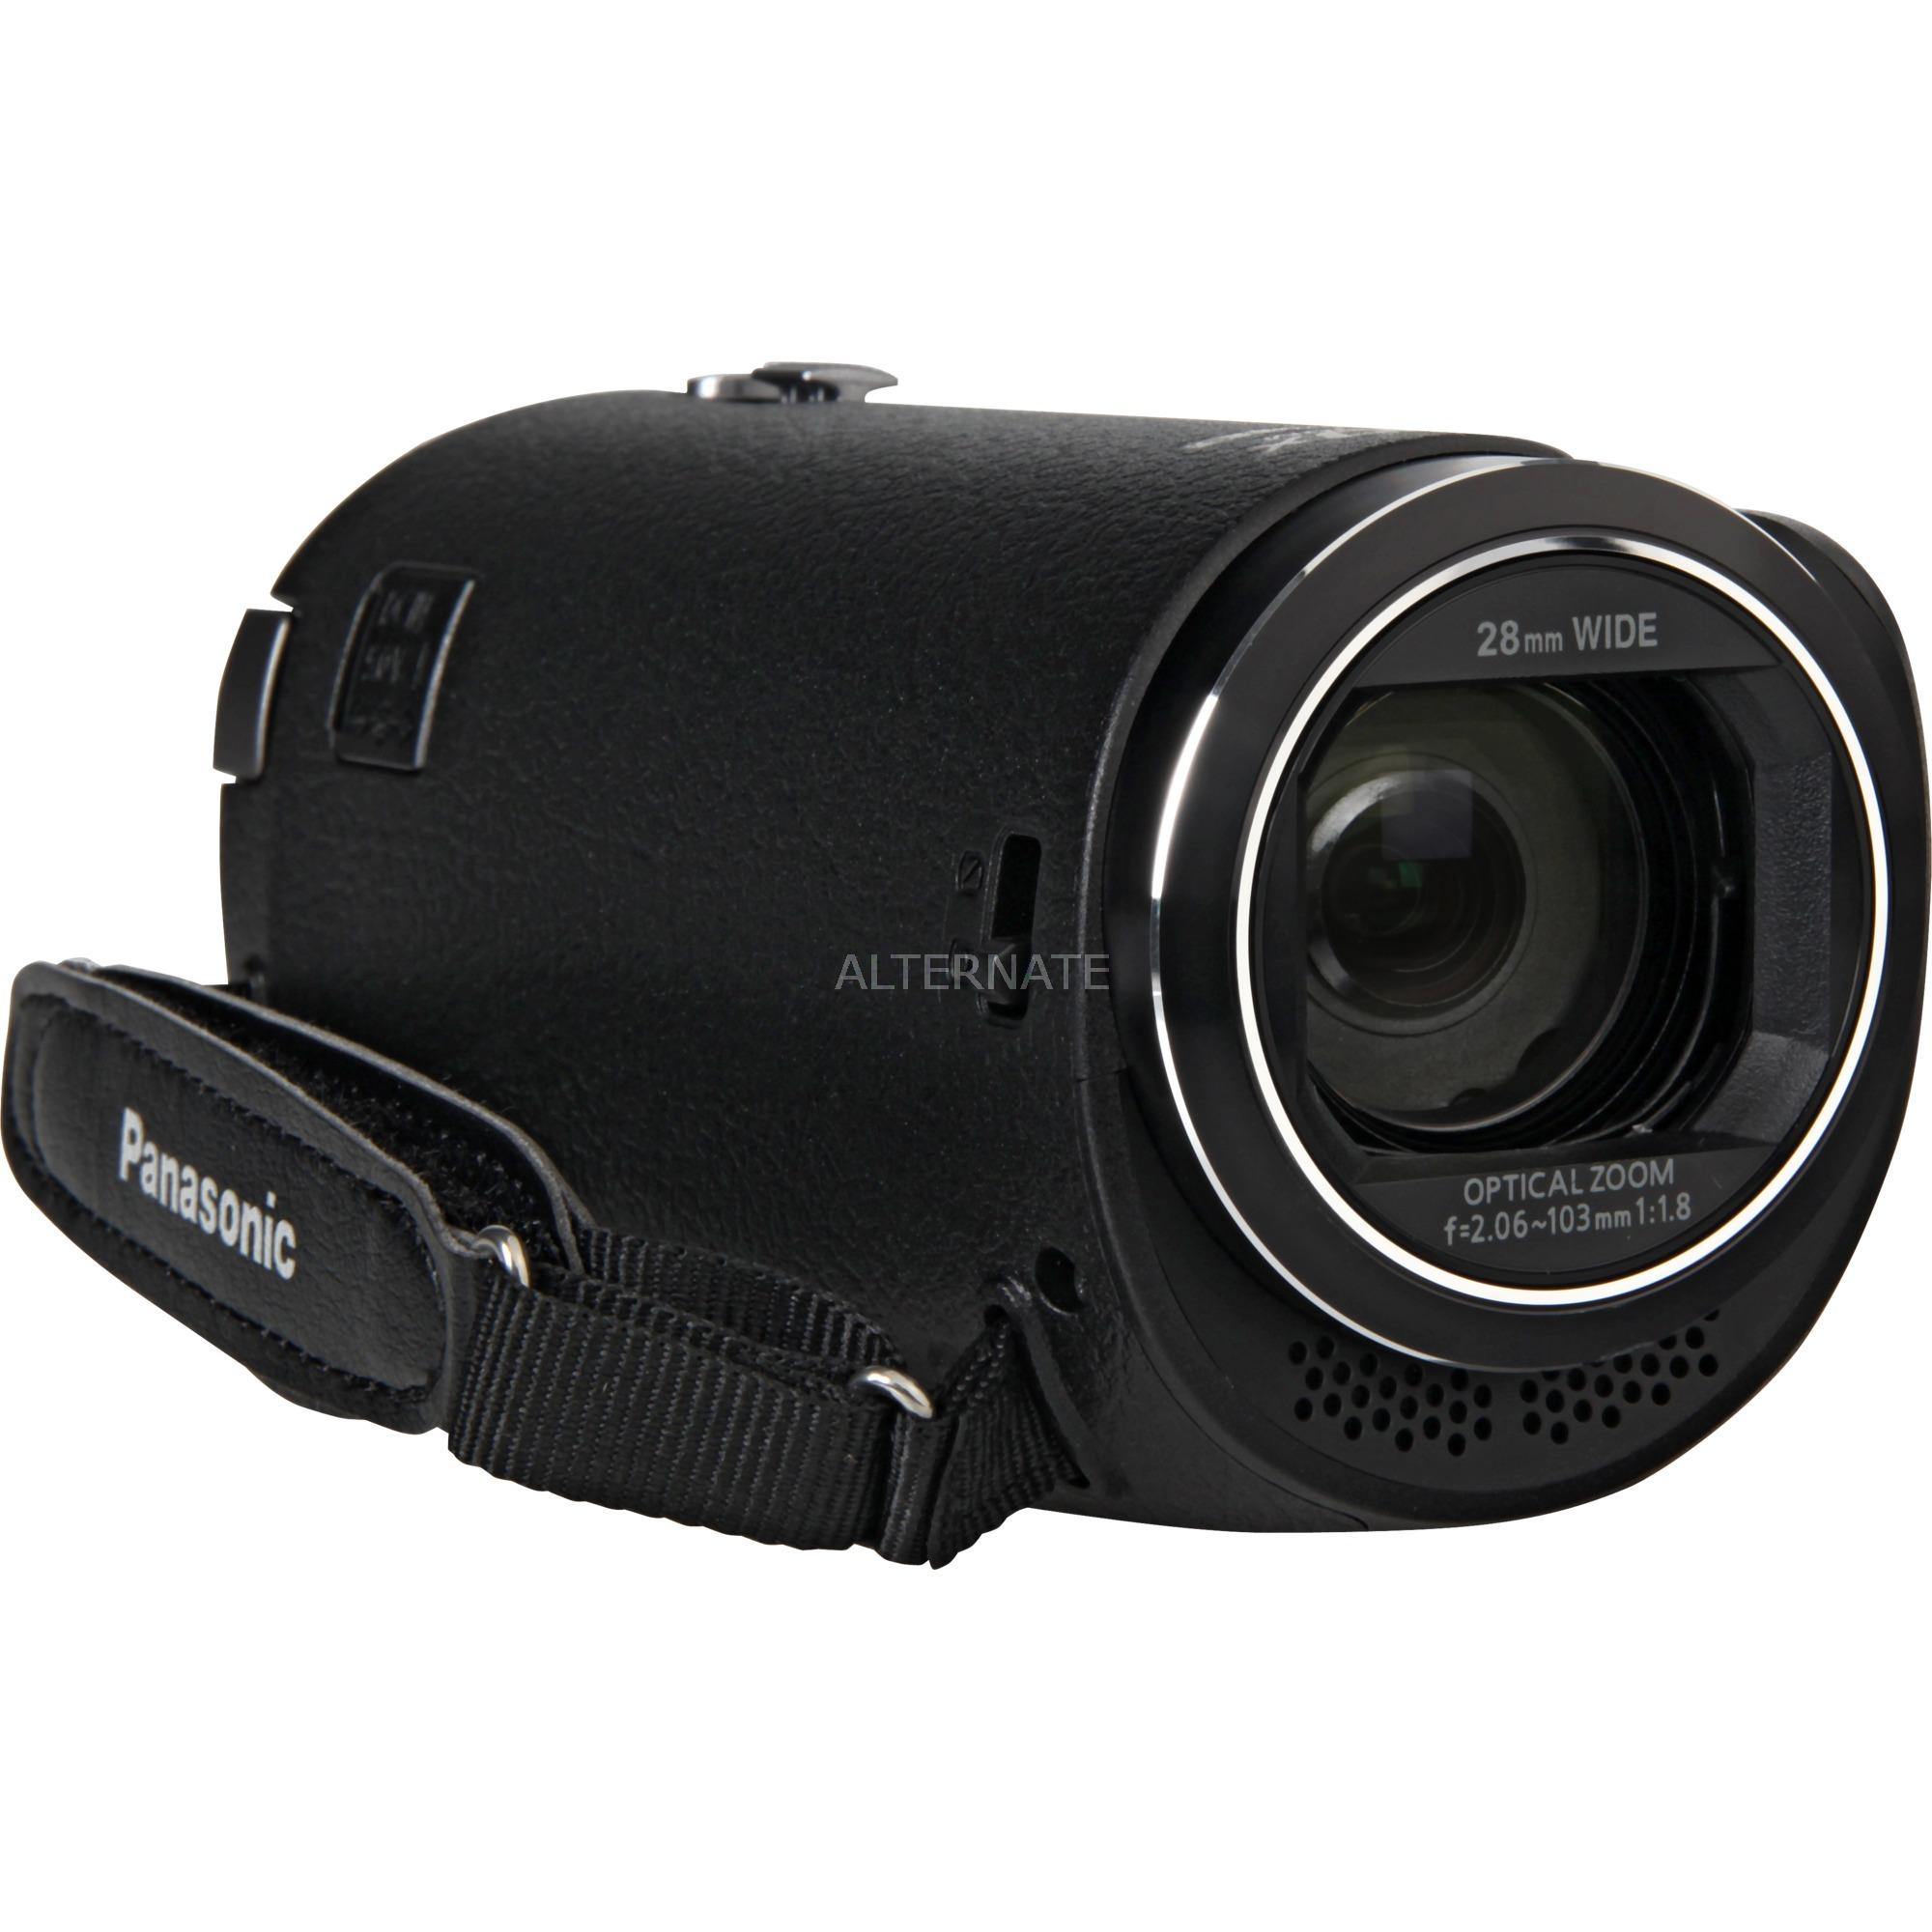 HC-V380EG-K soporte de videocámara 2,51 MP MOS BSI Videocámara manual Negro Full HD, Cámara de vídeo